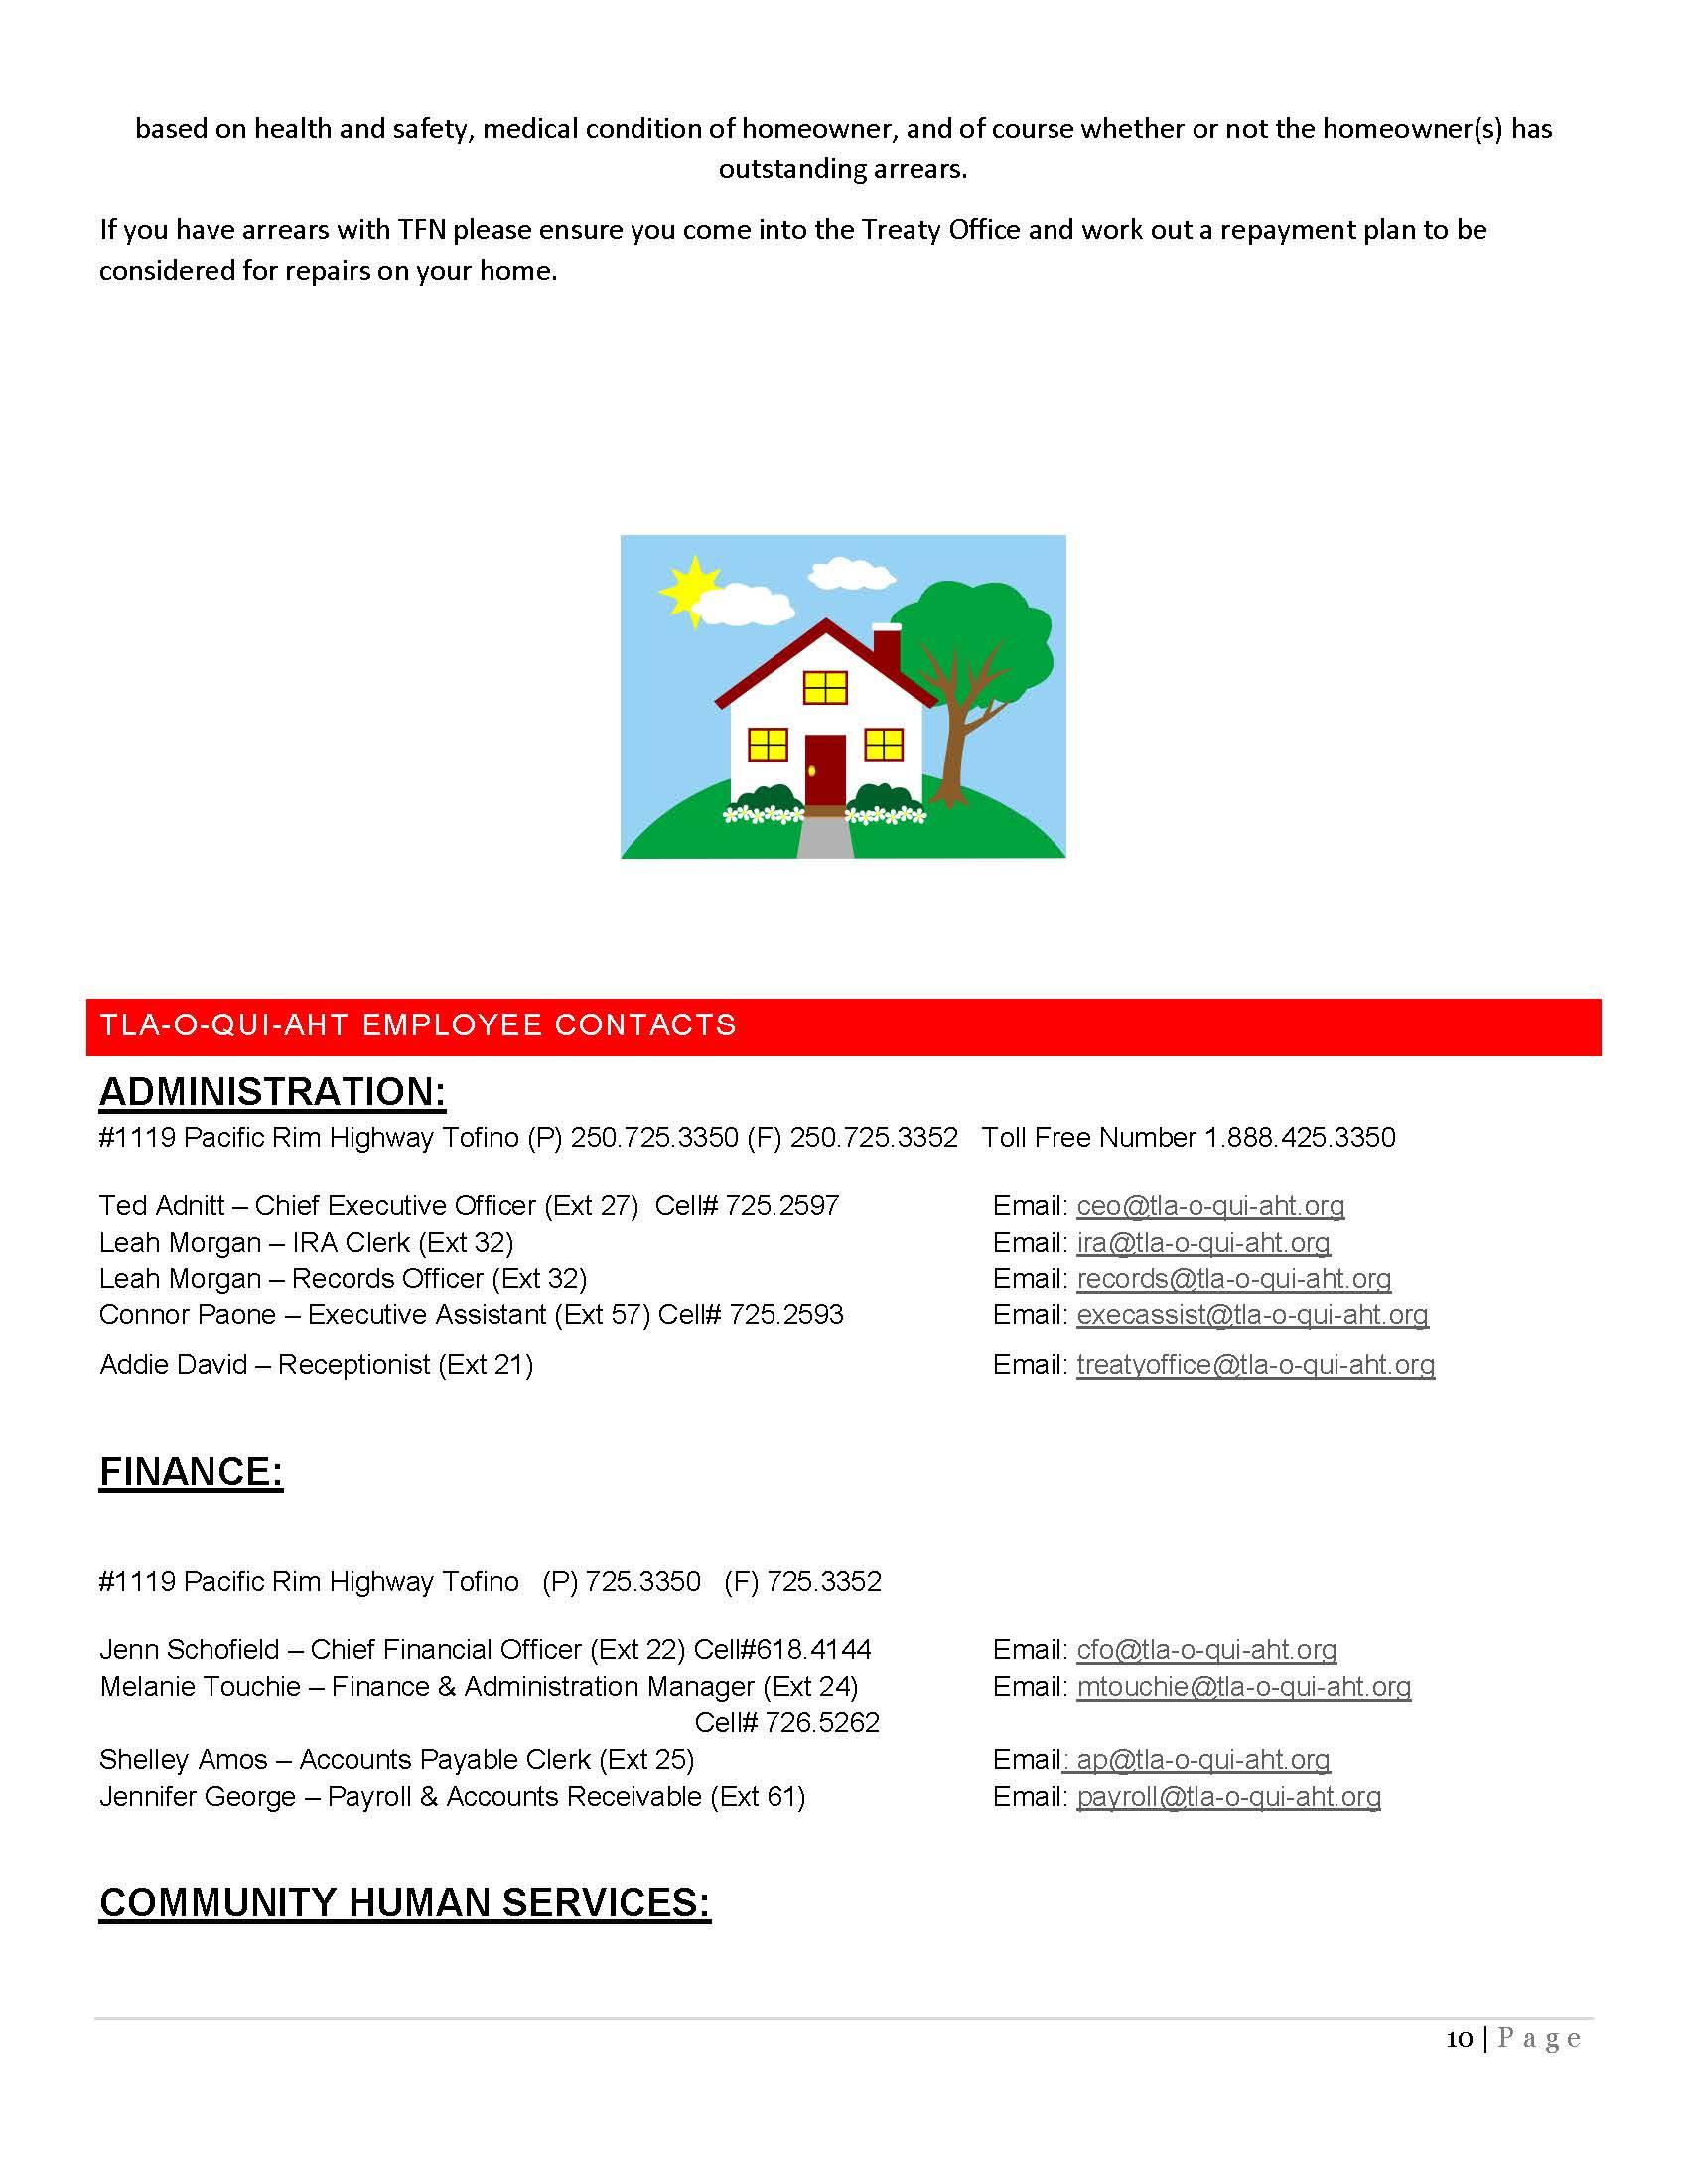 TFN Bulletin March 15-2017_Page_10.jpg